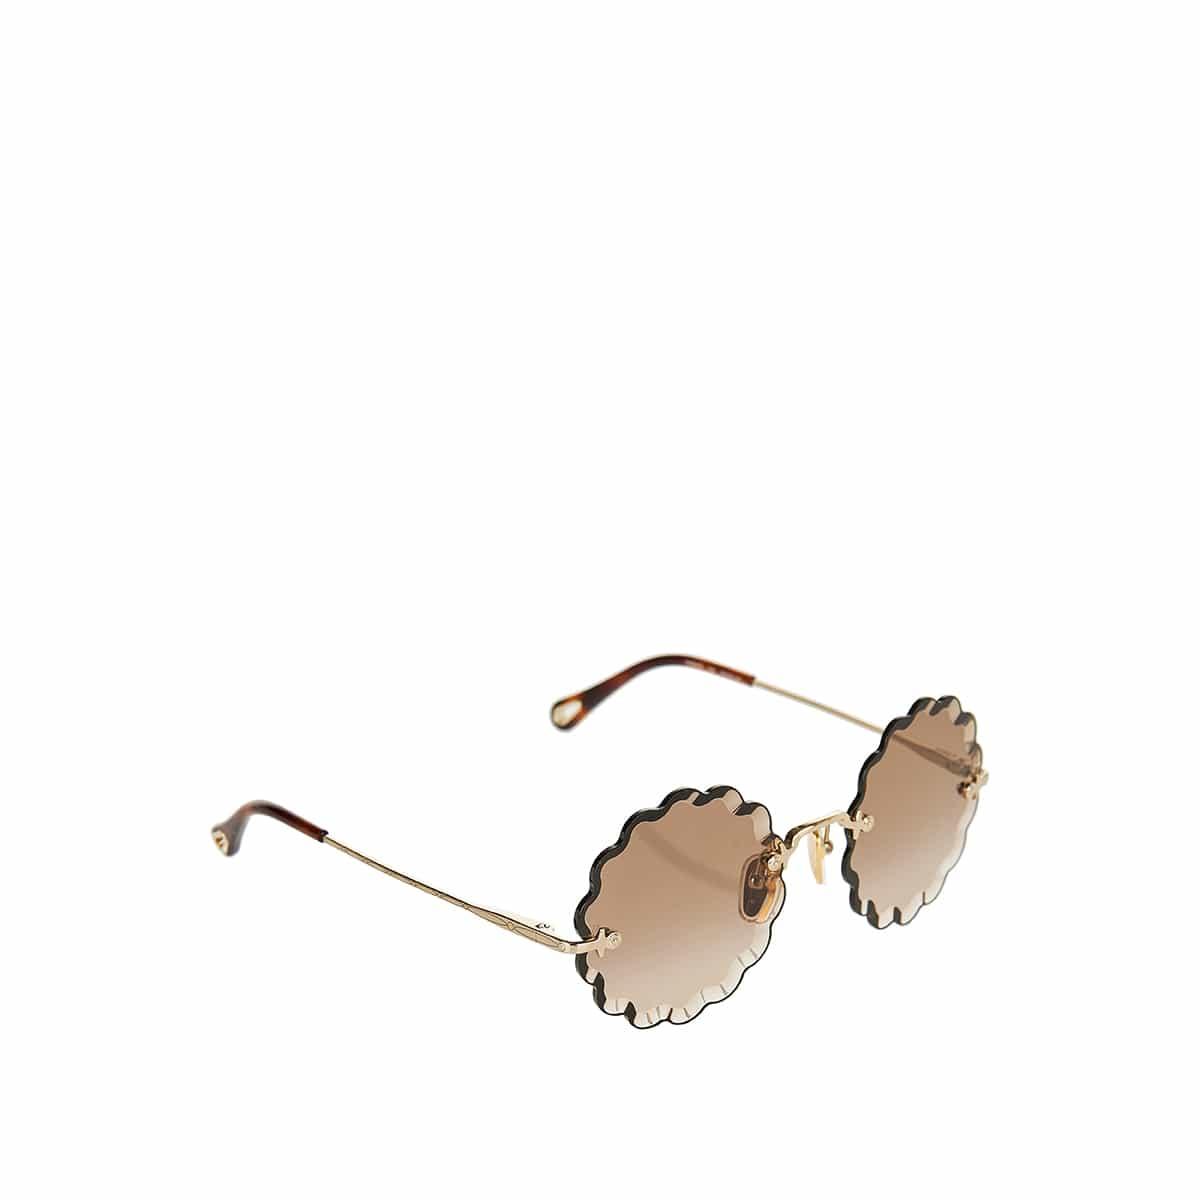 Rosie scalloped round sunglasses